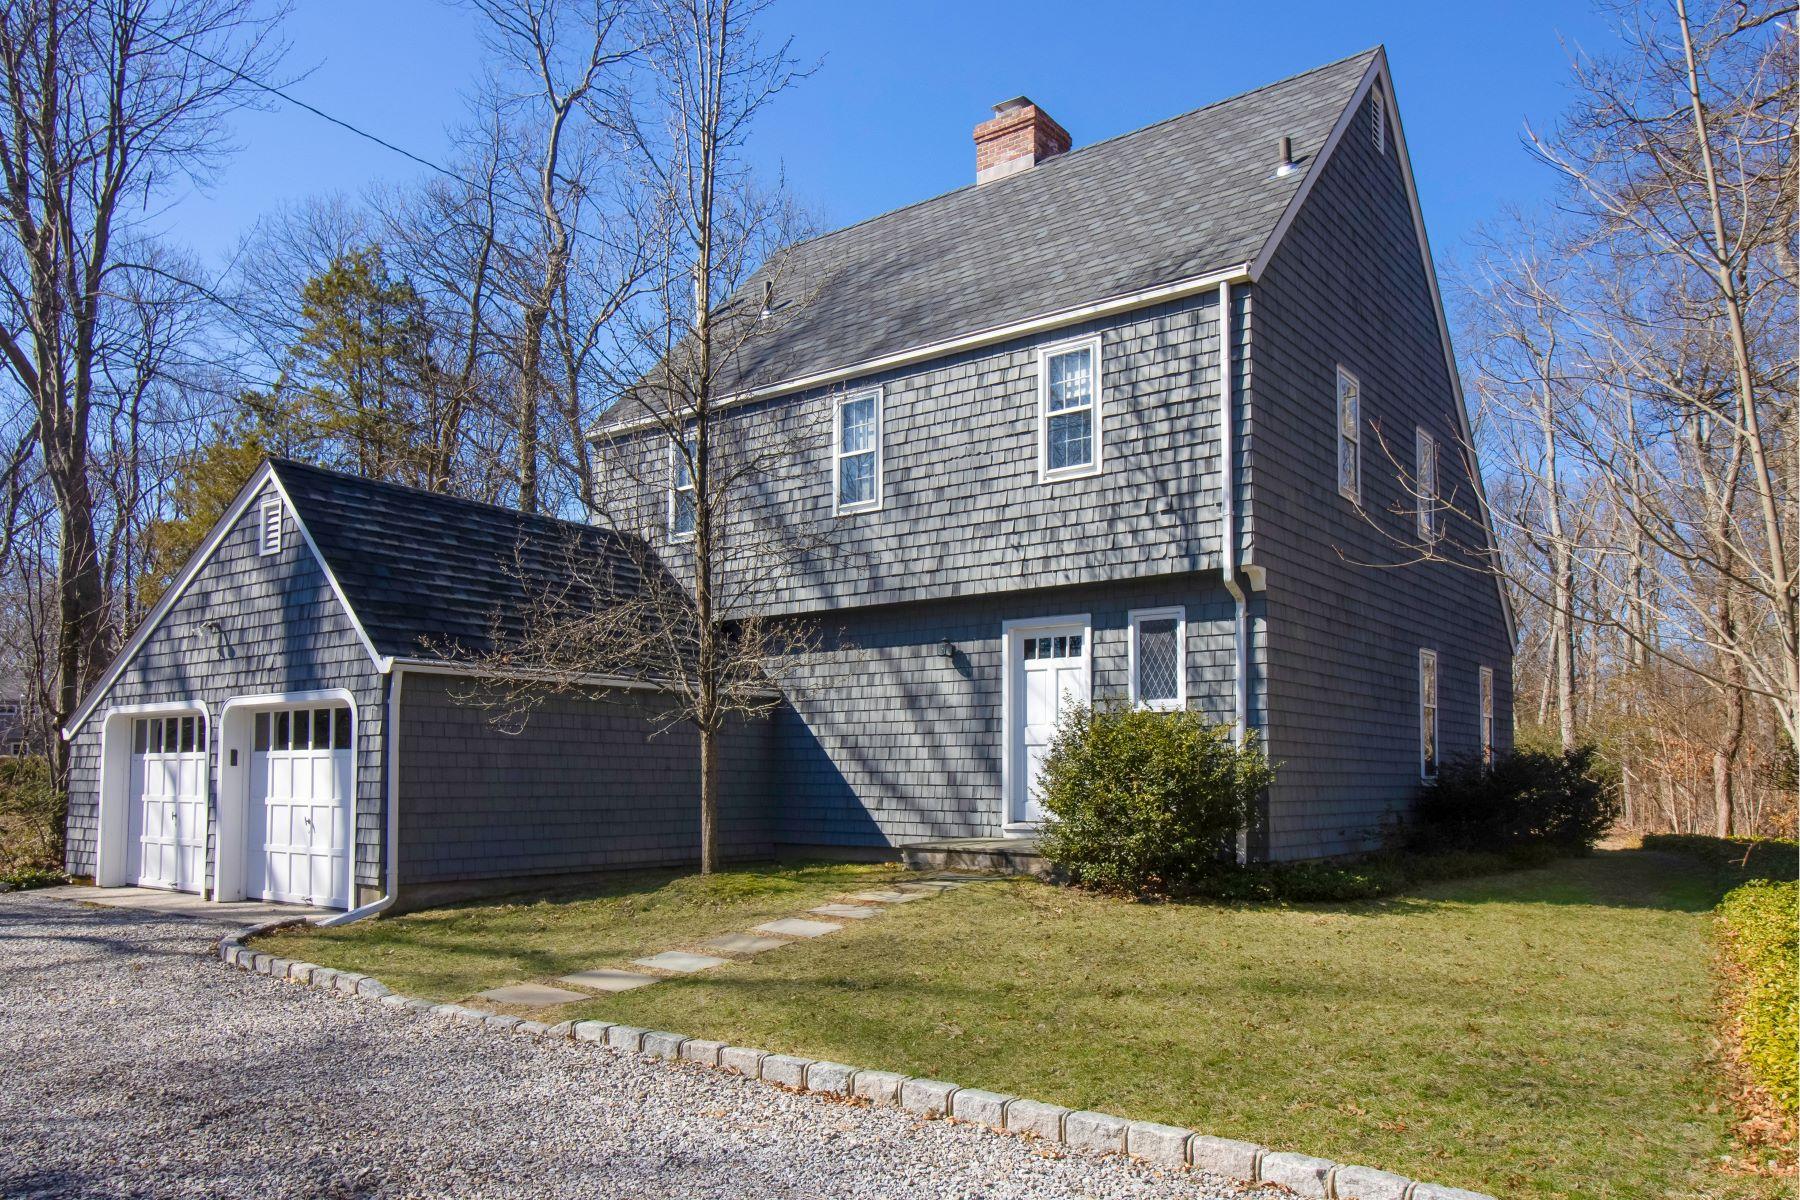 Single Family Homes for Sale at Stony Brook 132 Quaker Path Stony Brook, New York 11790 United States